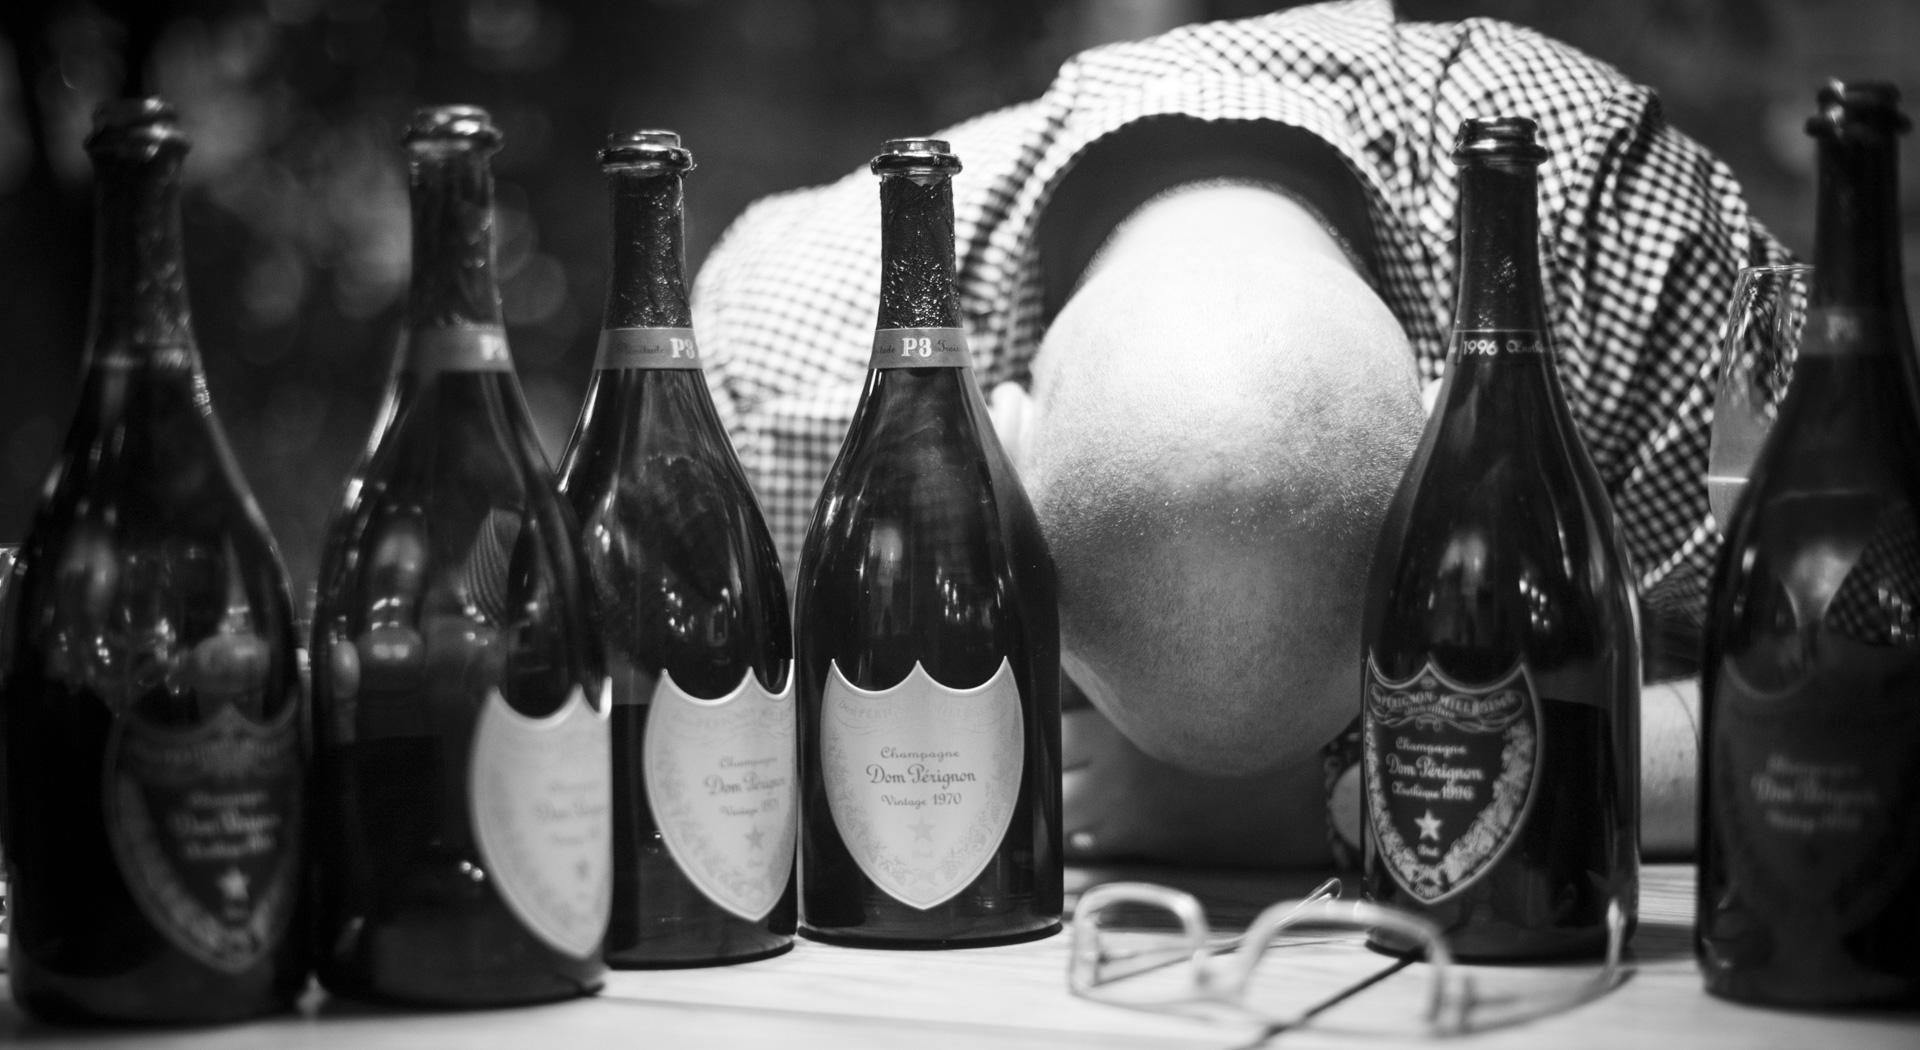 Glamourland Dom Perignon Vintage 2006 (16)